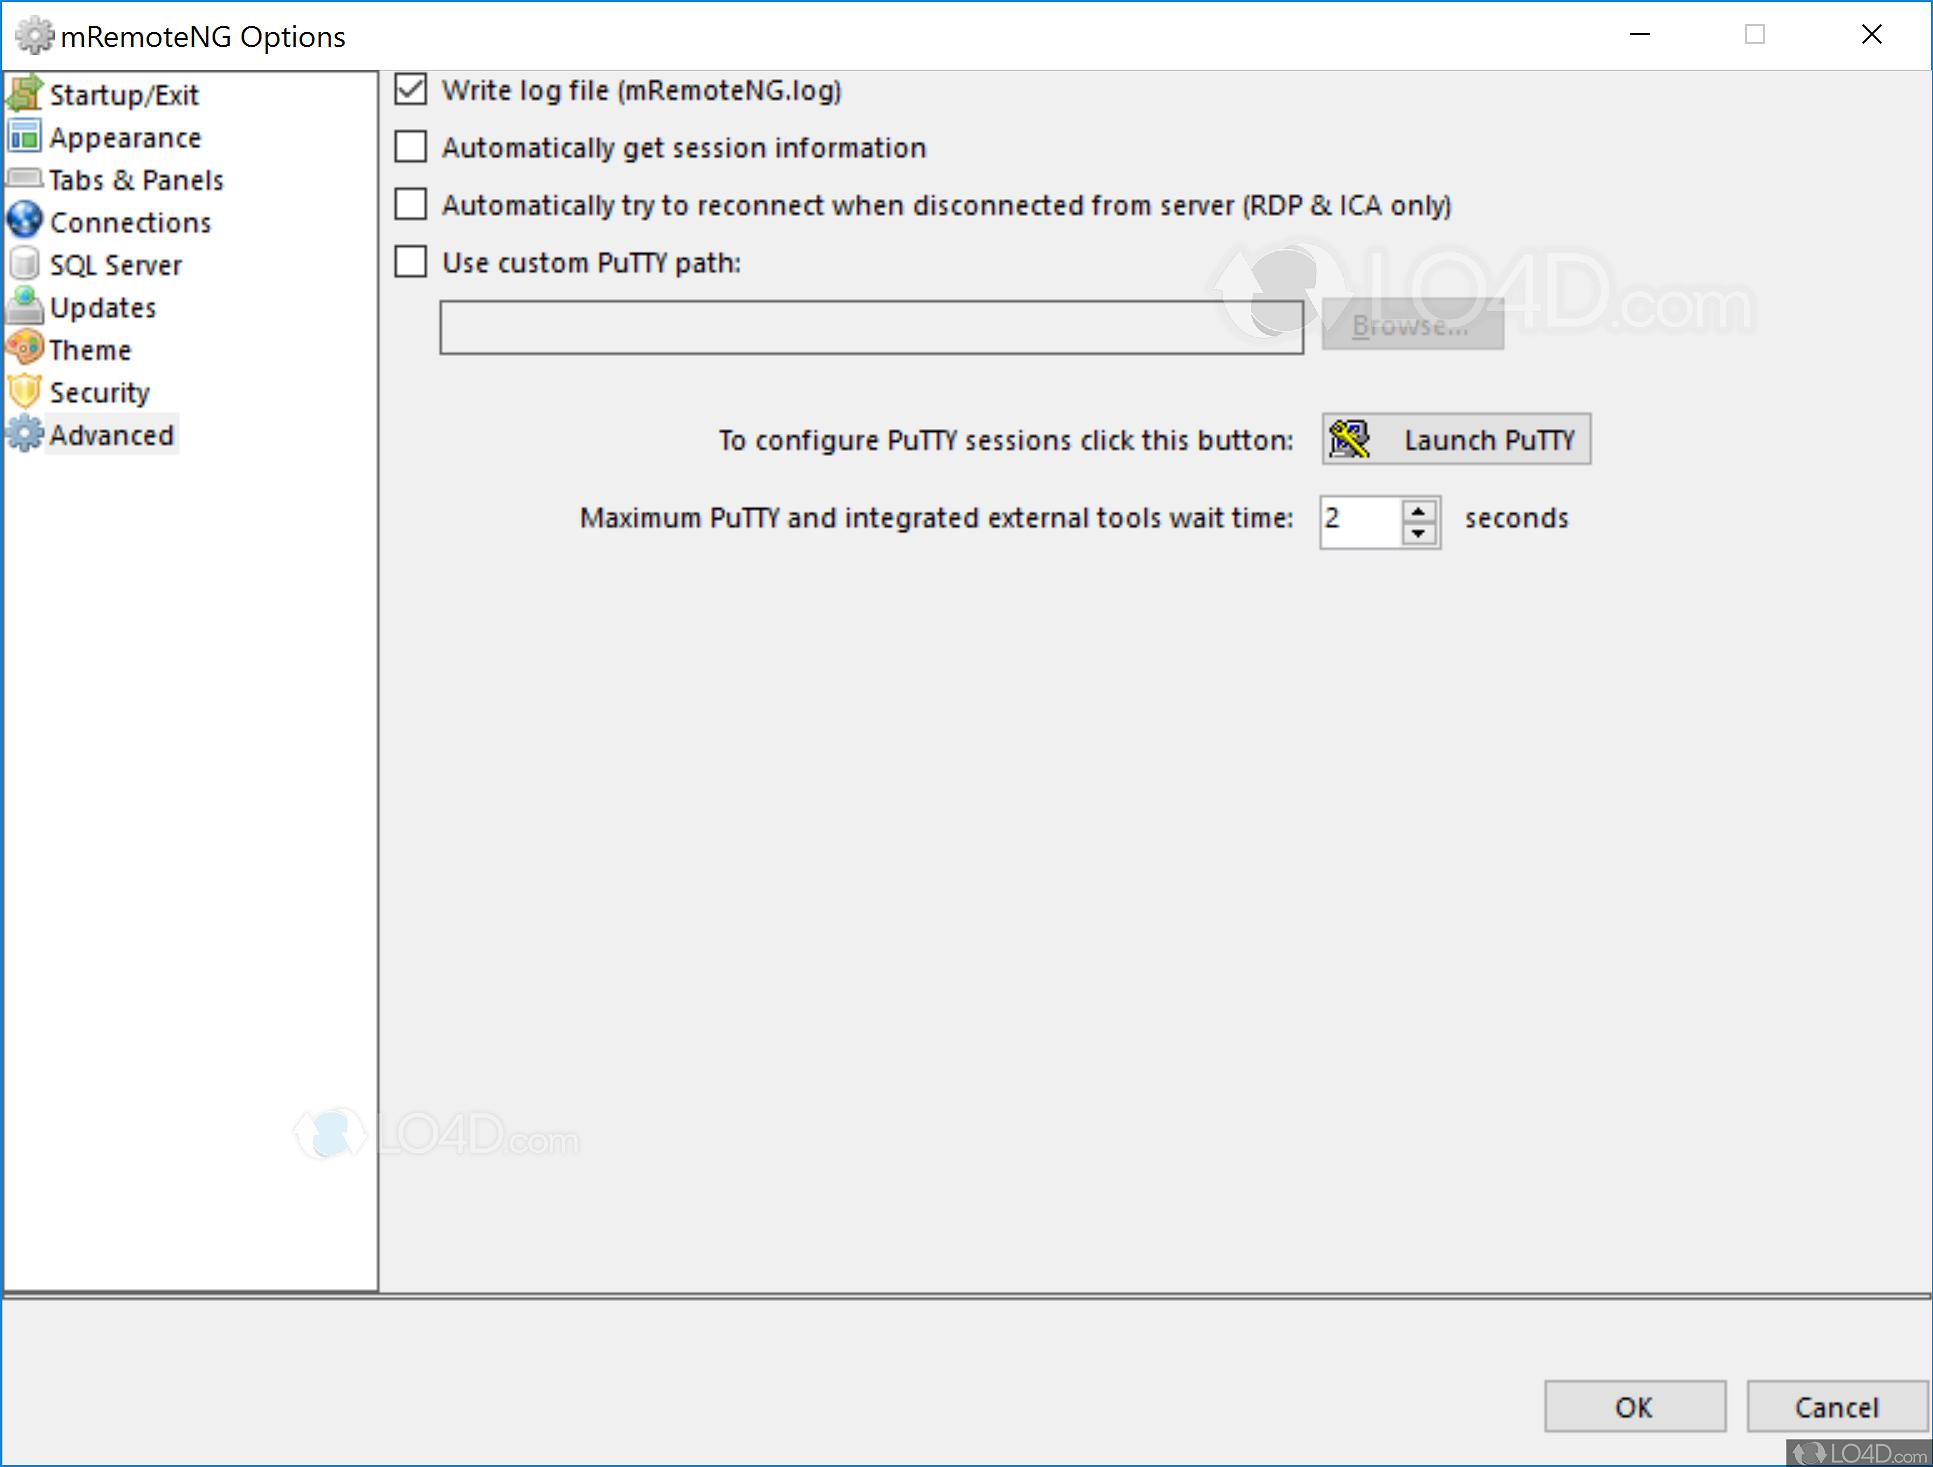 Mremoteng 1. 74 free download software reviews, downloads, news.